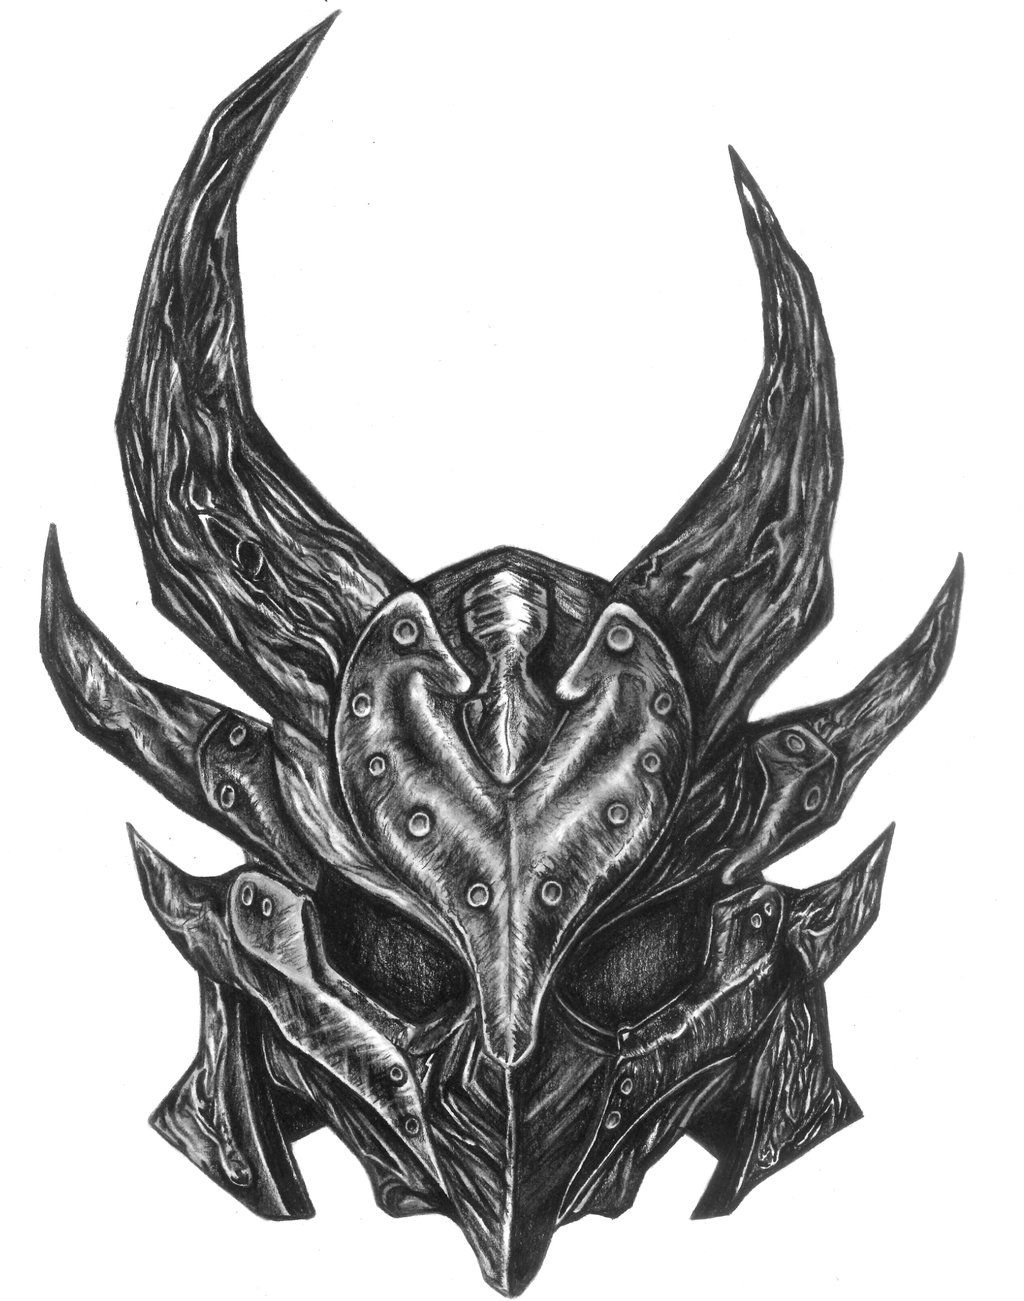 Skyrim Daedric Helmet Charcoal by darkenedhearte.deviantart.com on @deviantART -- hand tattoo?? I think so